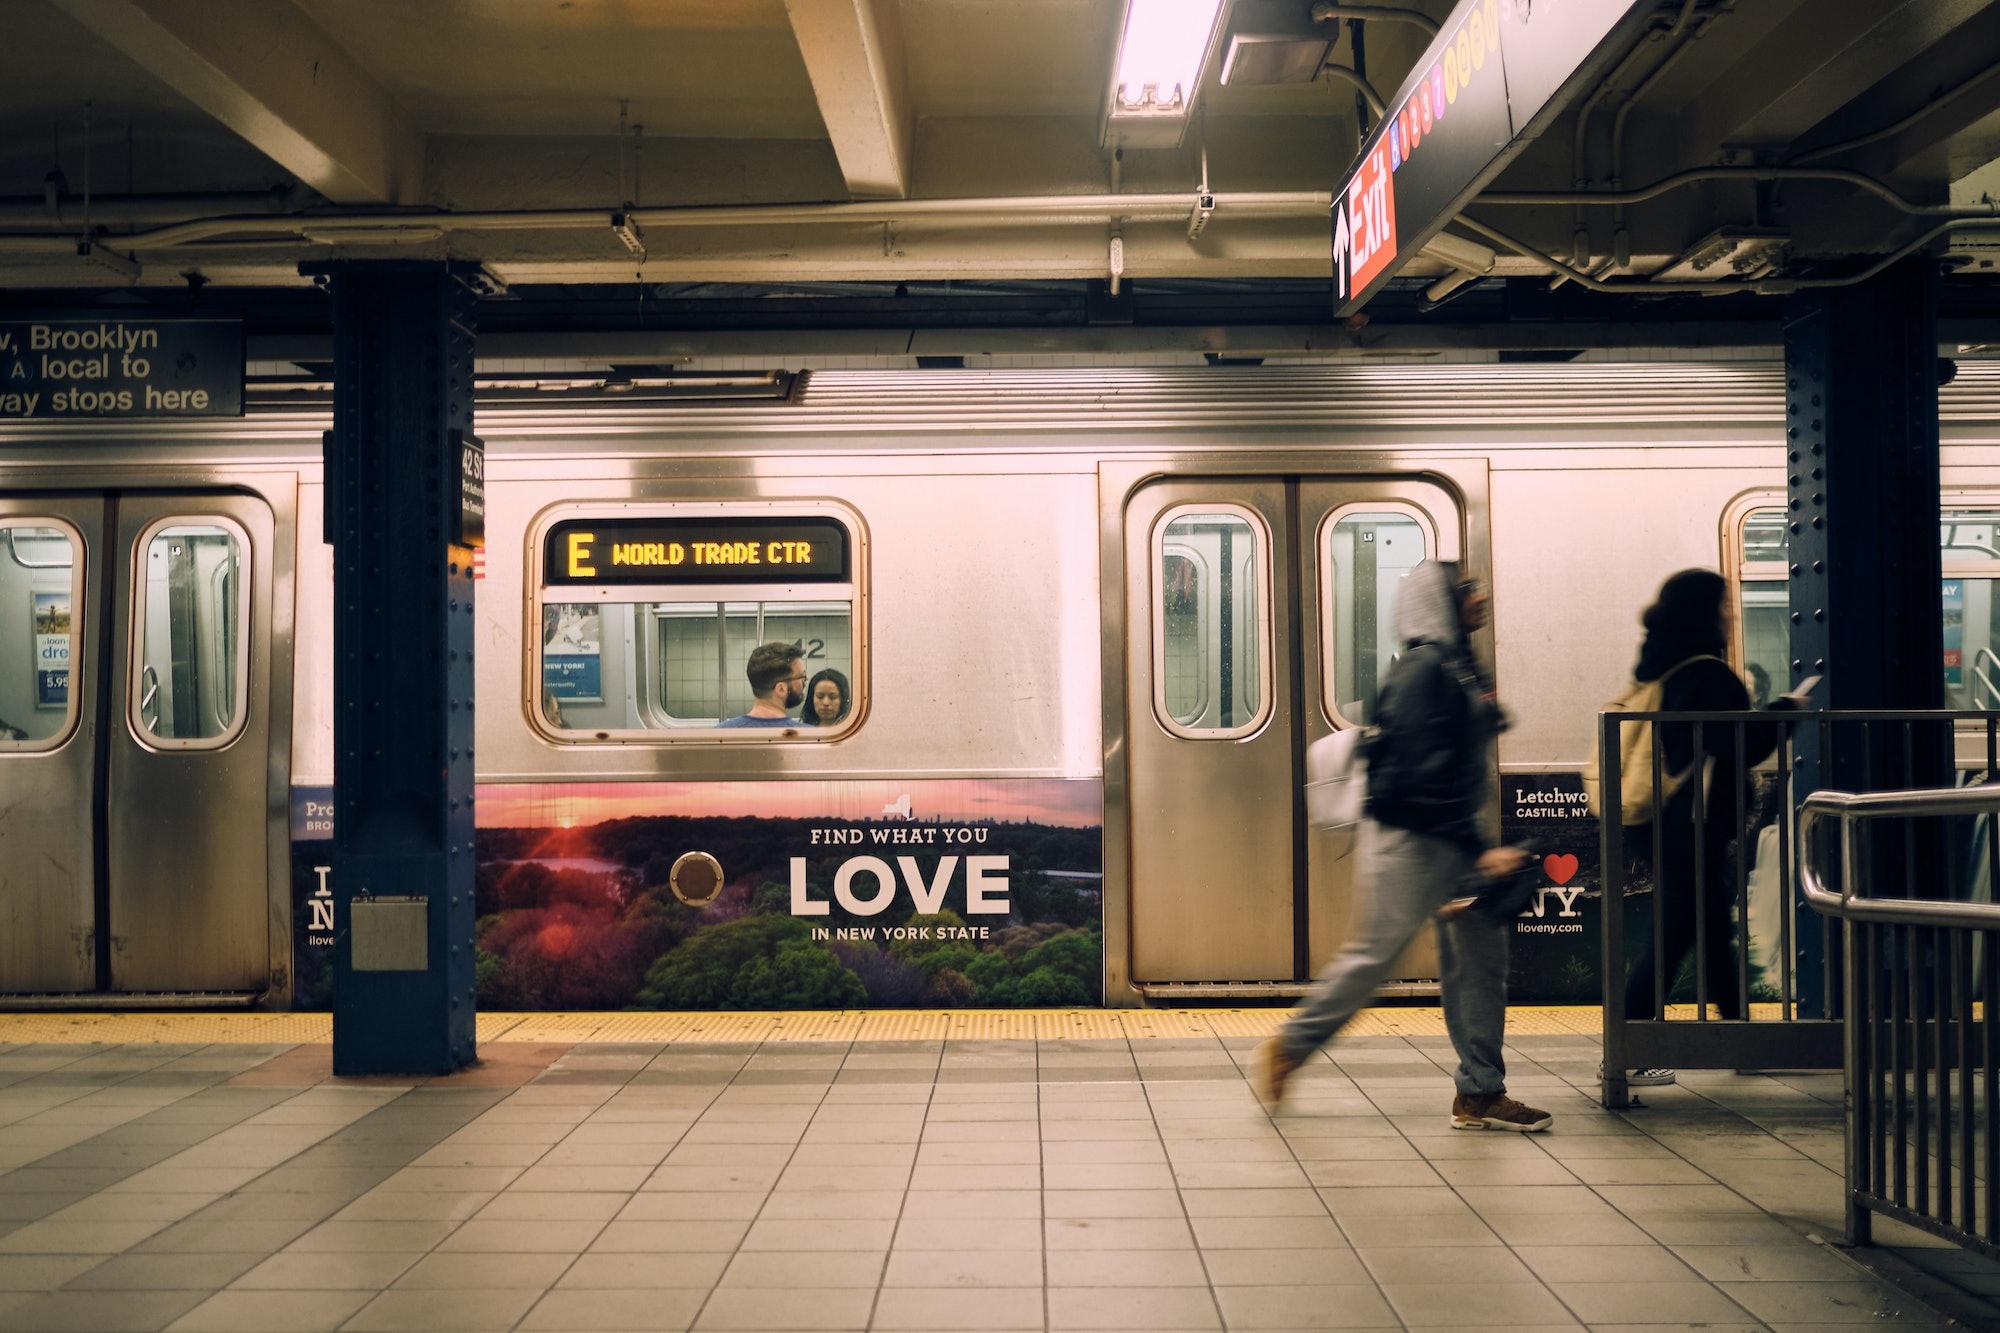 The New York City subway: ready for UWB?